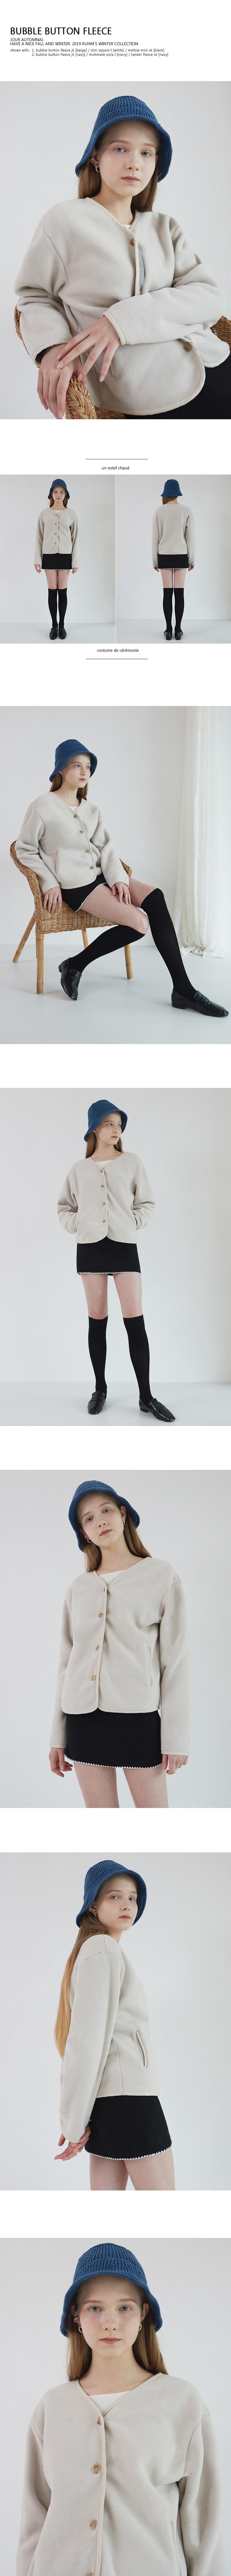 BUBBLE BUTTON FLEECE JK (NAVY) - 루흠 (RUHM), 89,000원, 아우터, 자켓